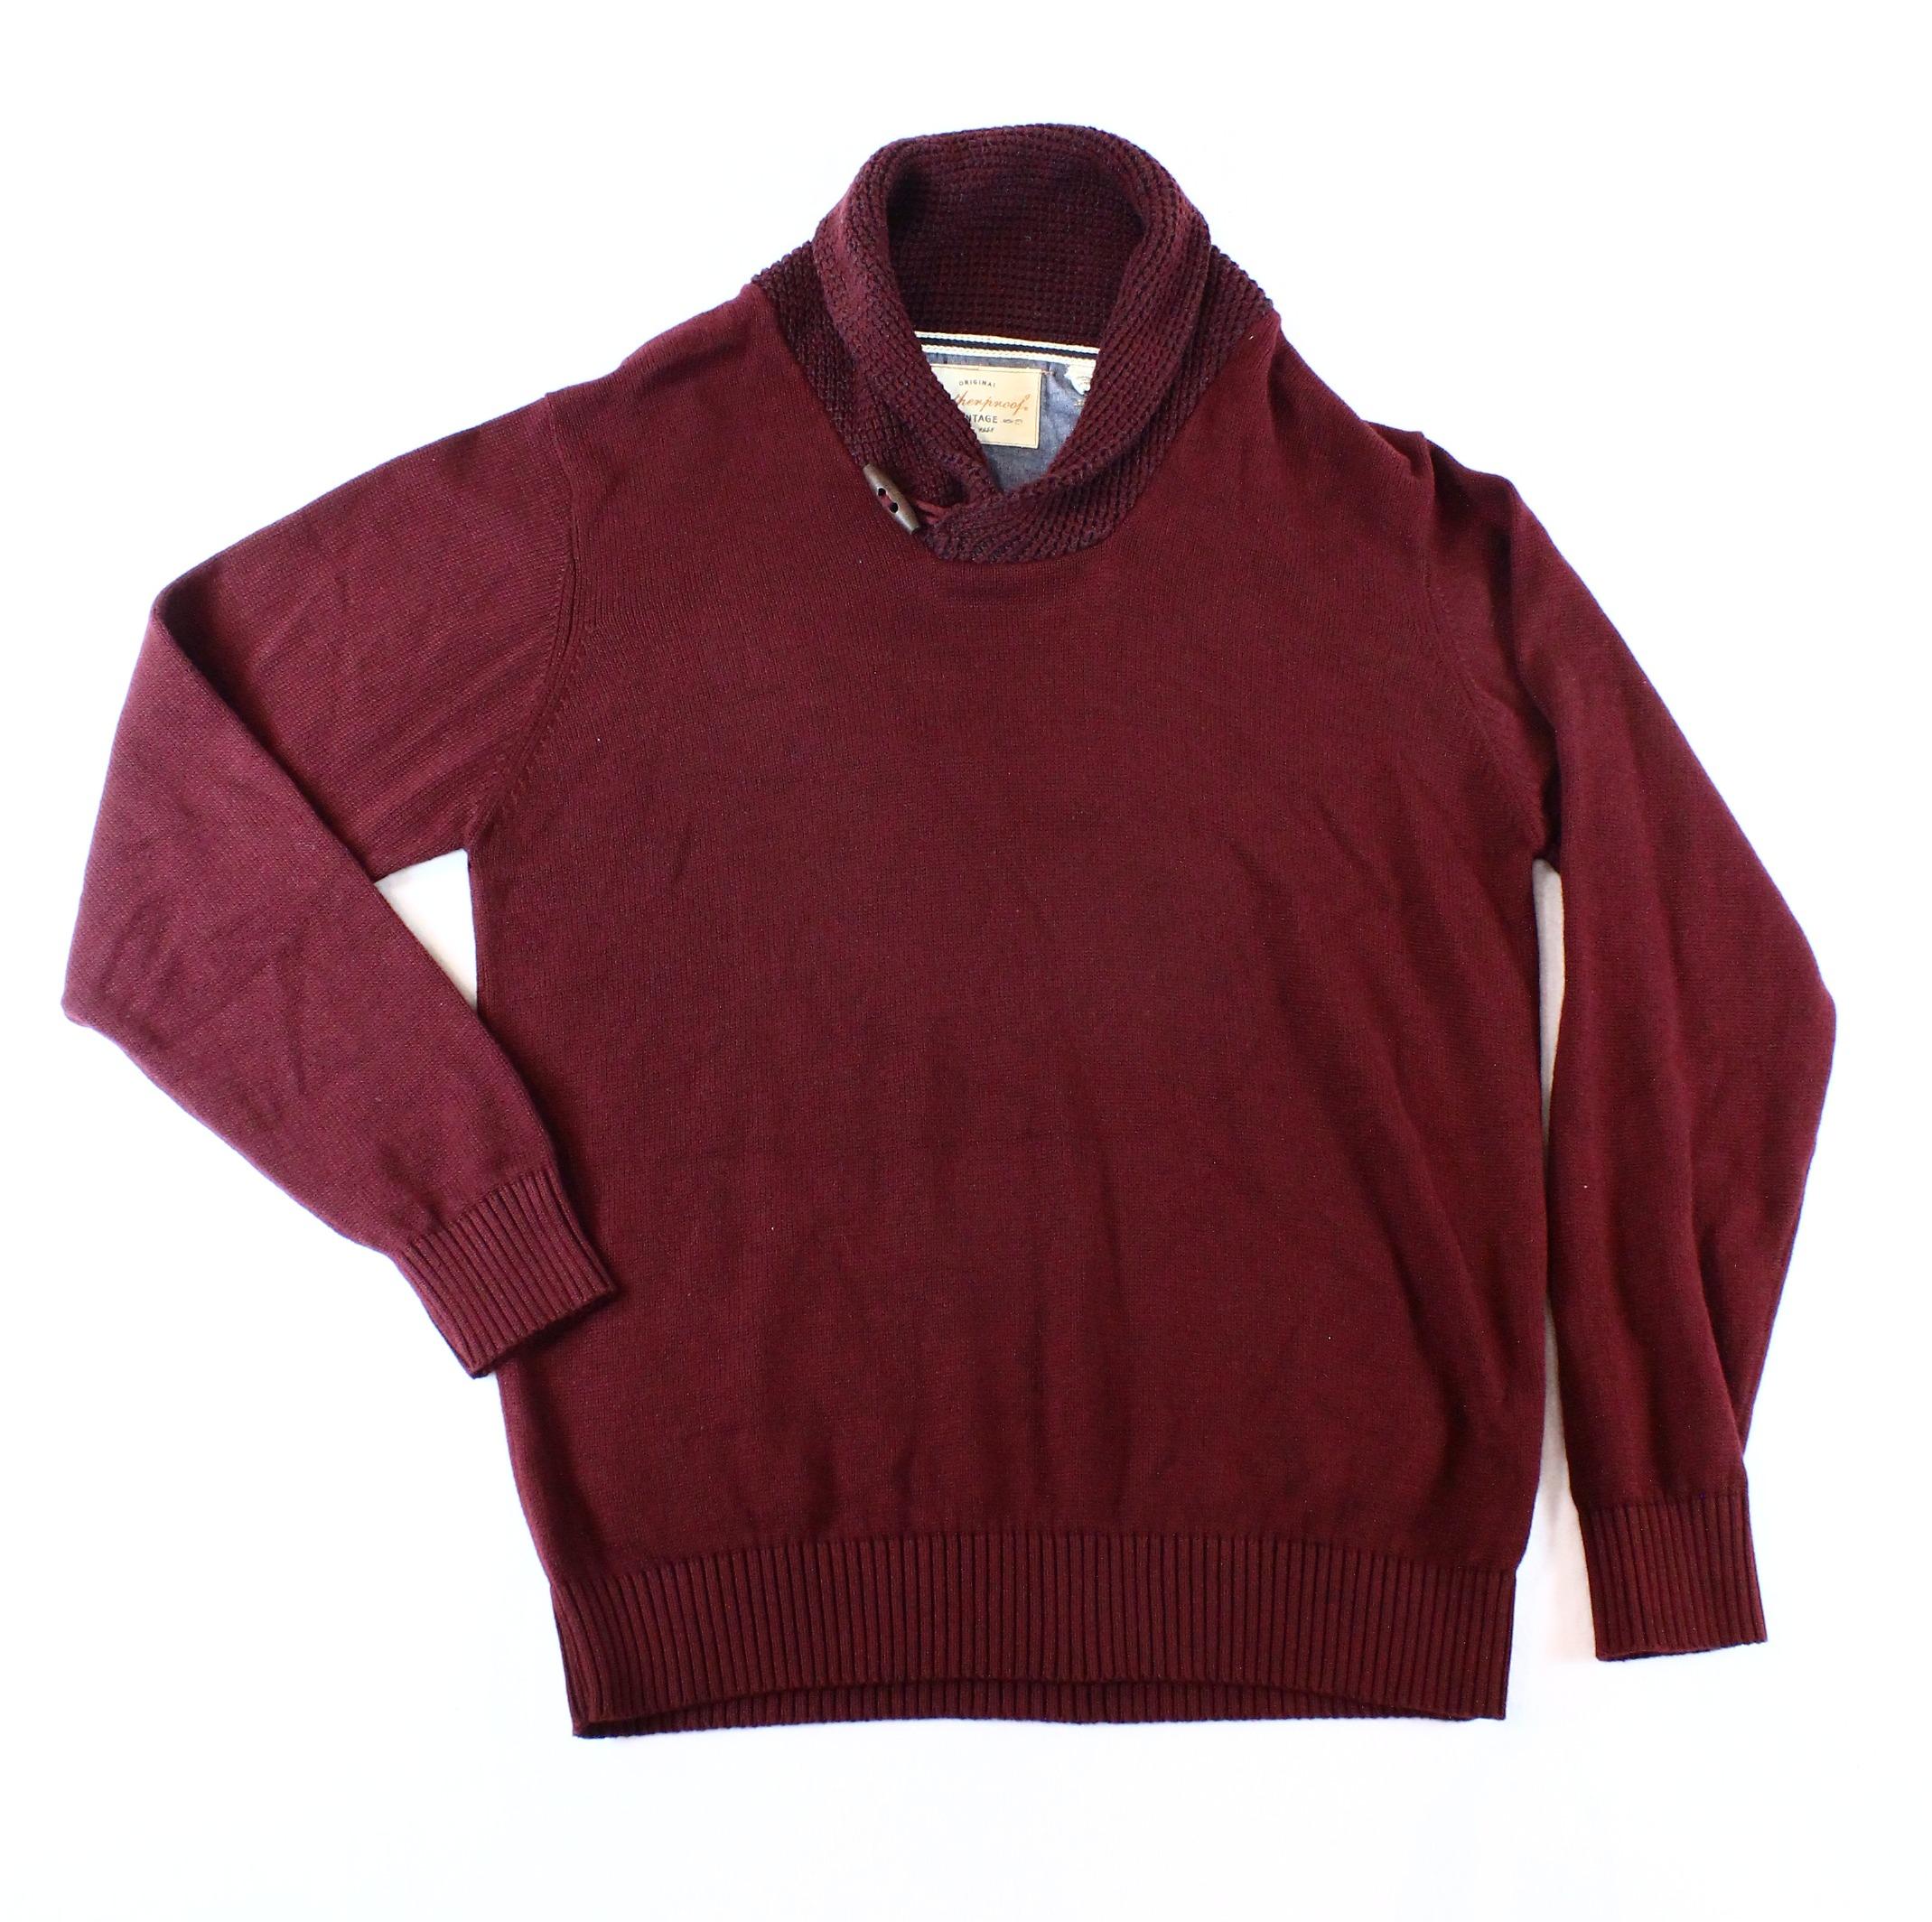 Weatherproof NEW Red Burgundy Mens Size 2XL Shawl-Collar Waffle-Knit Sweater